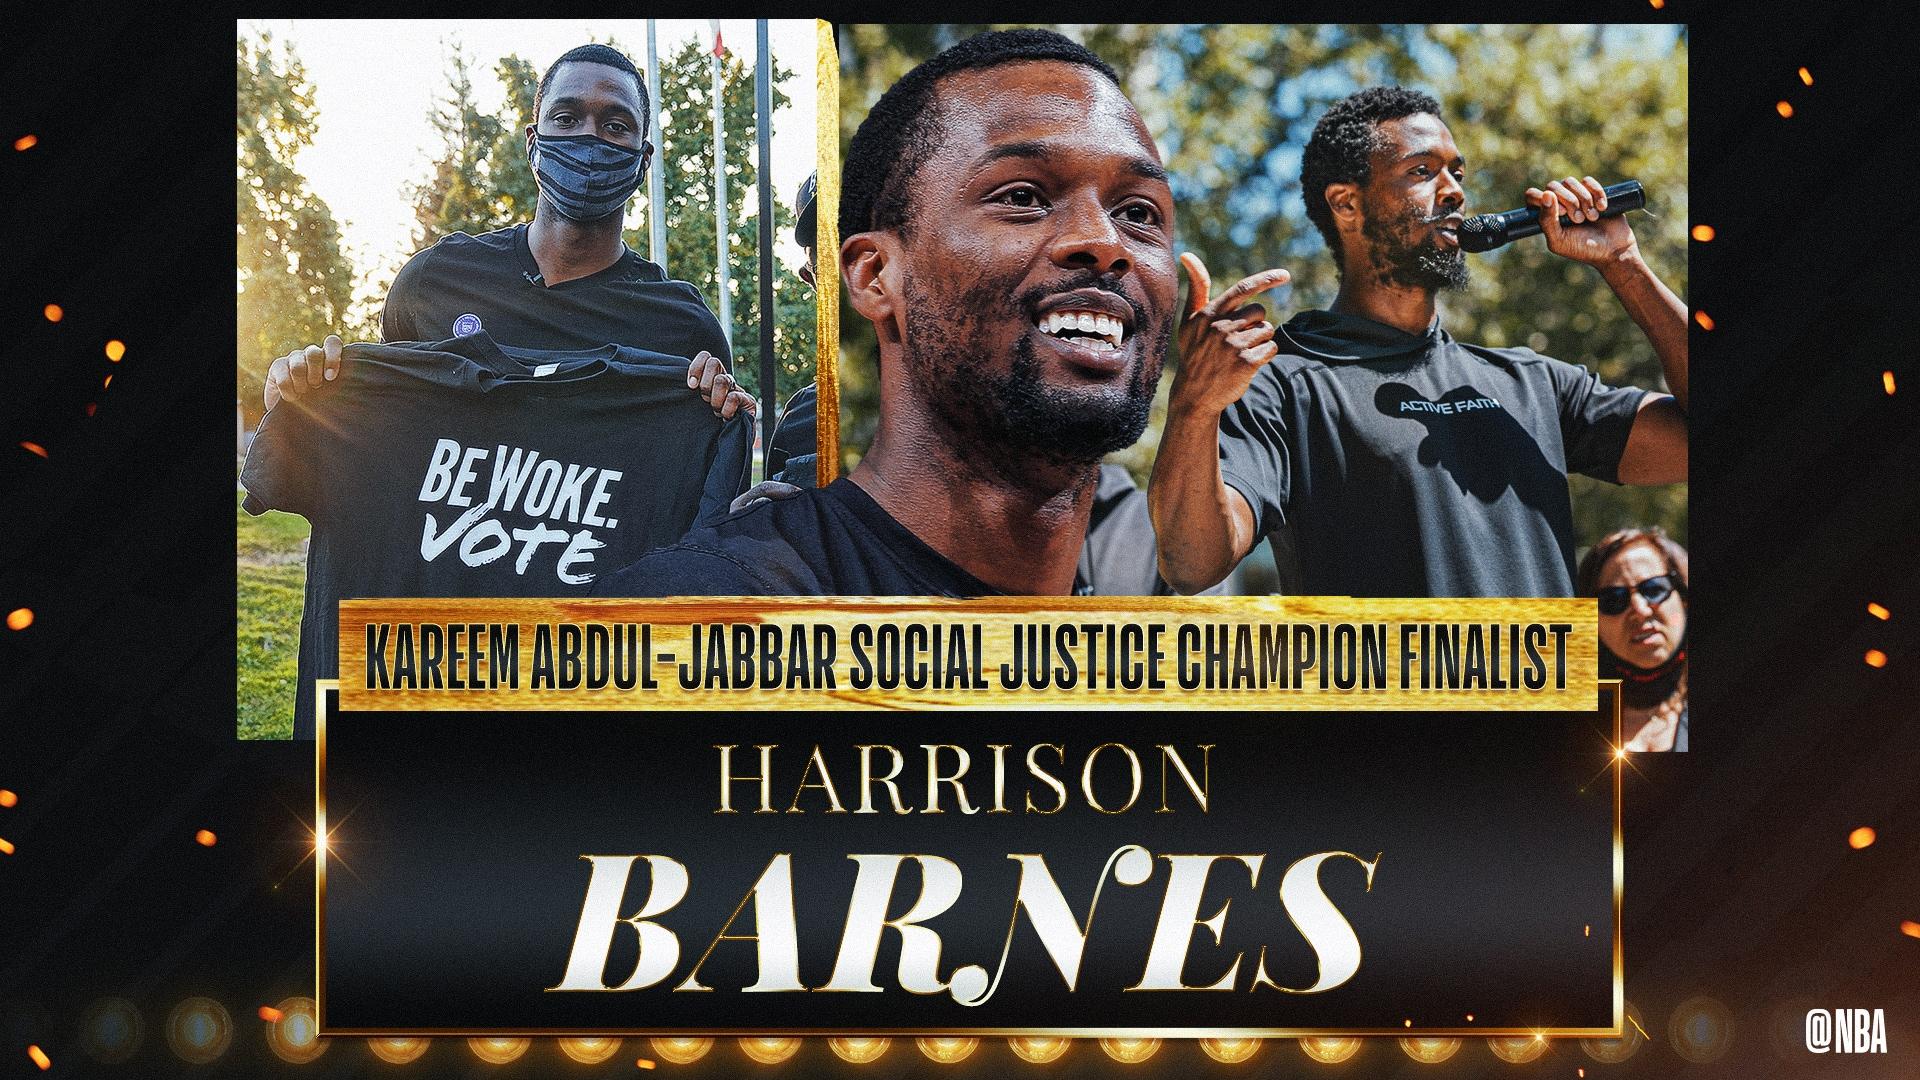 Kareem Abdul-Jabbar Social Justice Champion Finalist: Harrison Barnes